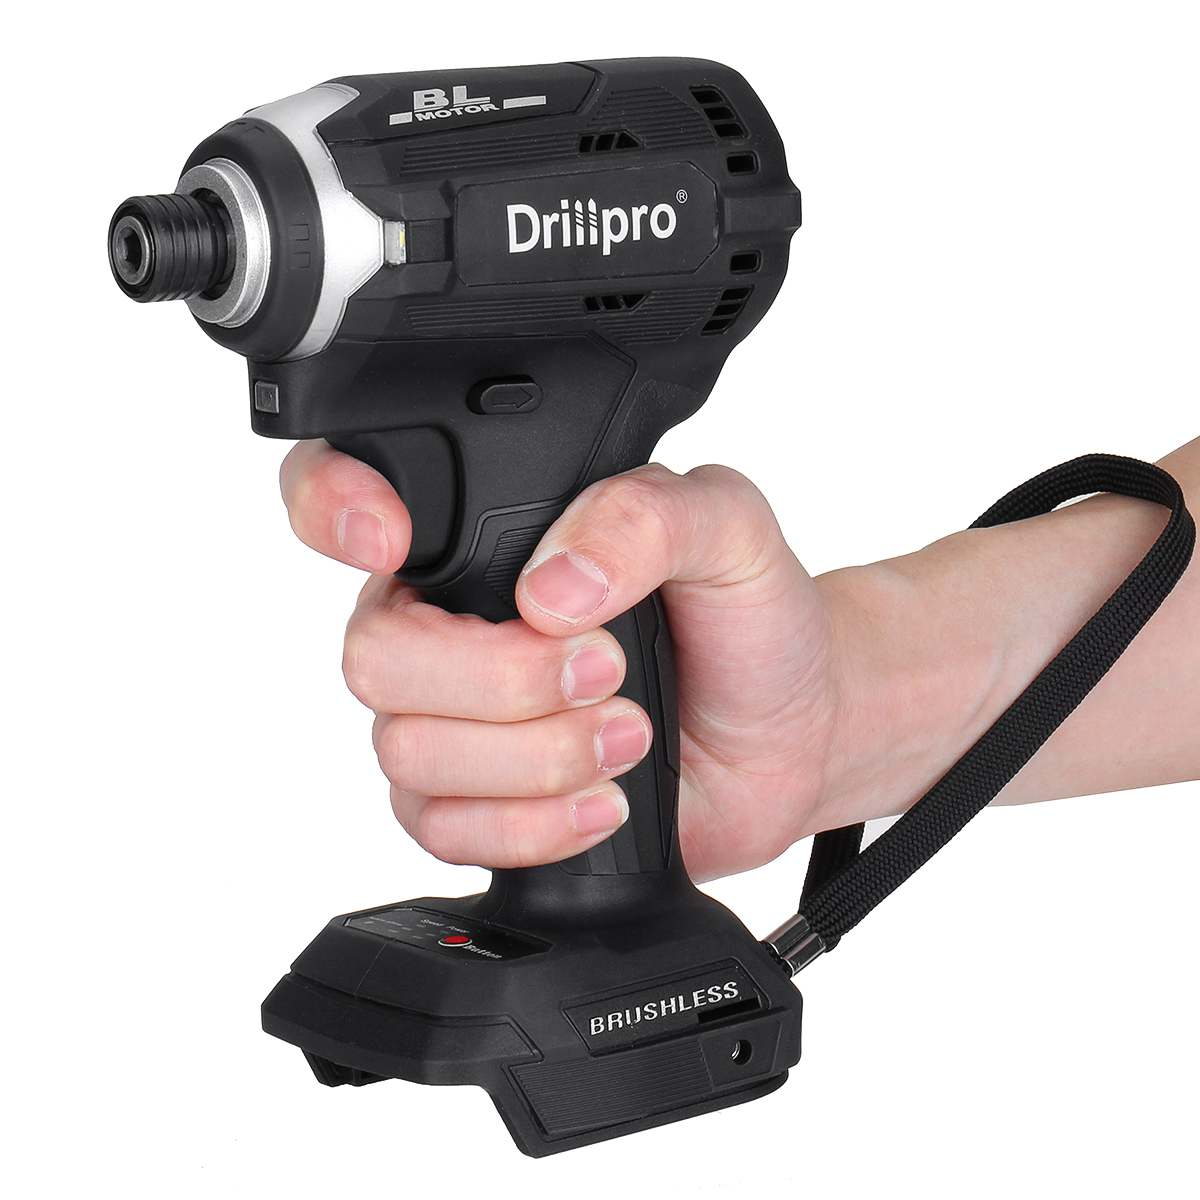 Drillpro فرش مفك كهربائي لاسلكي 1/4 ''تأثير وجع قابلة للشحن الحفر سائق + 3 ضوء ل ماكيتا 18V بطارية